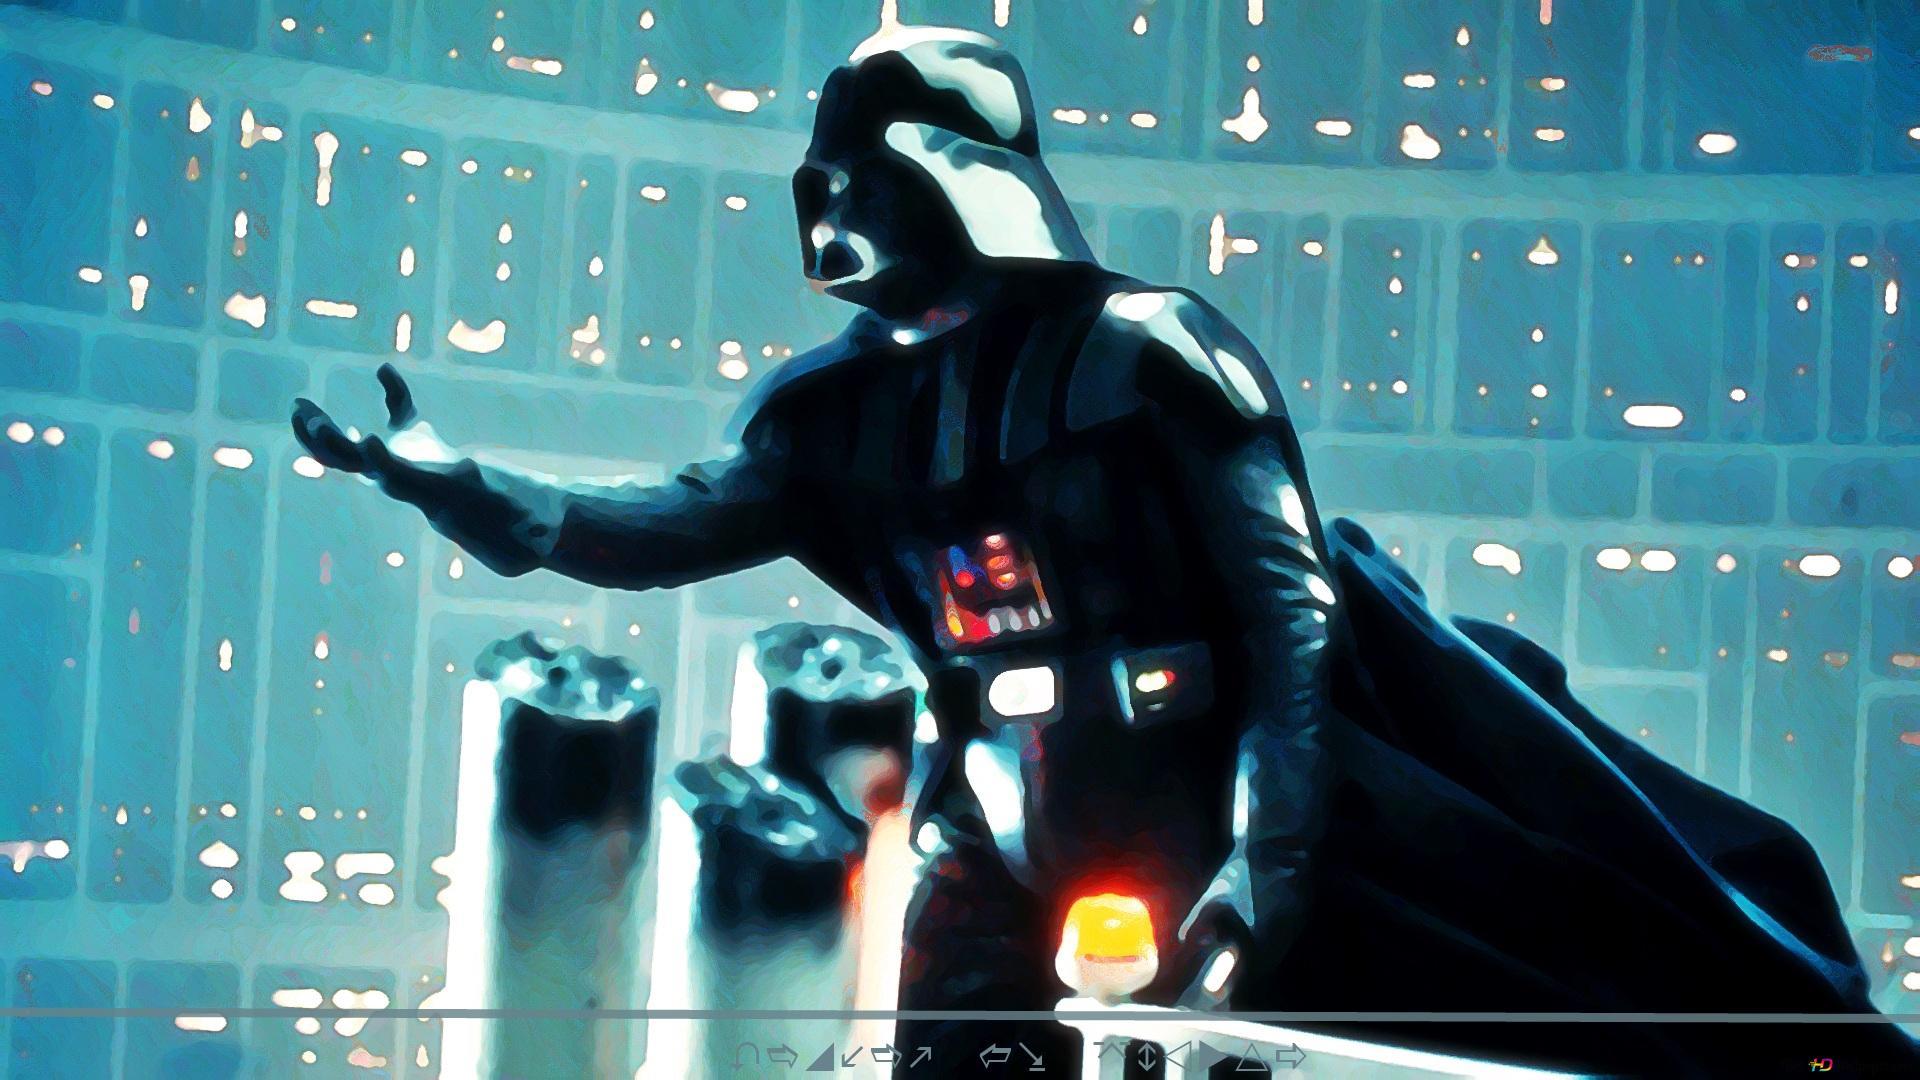 Star Wars Ii Attack Of The Clones Darth Vadar Hd Wallpaper Download